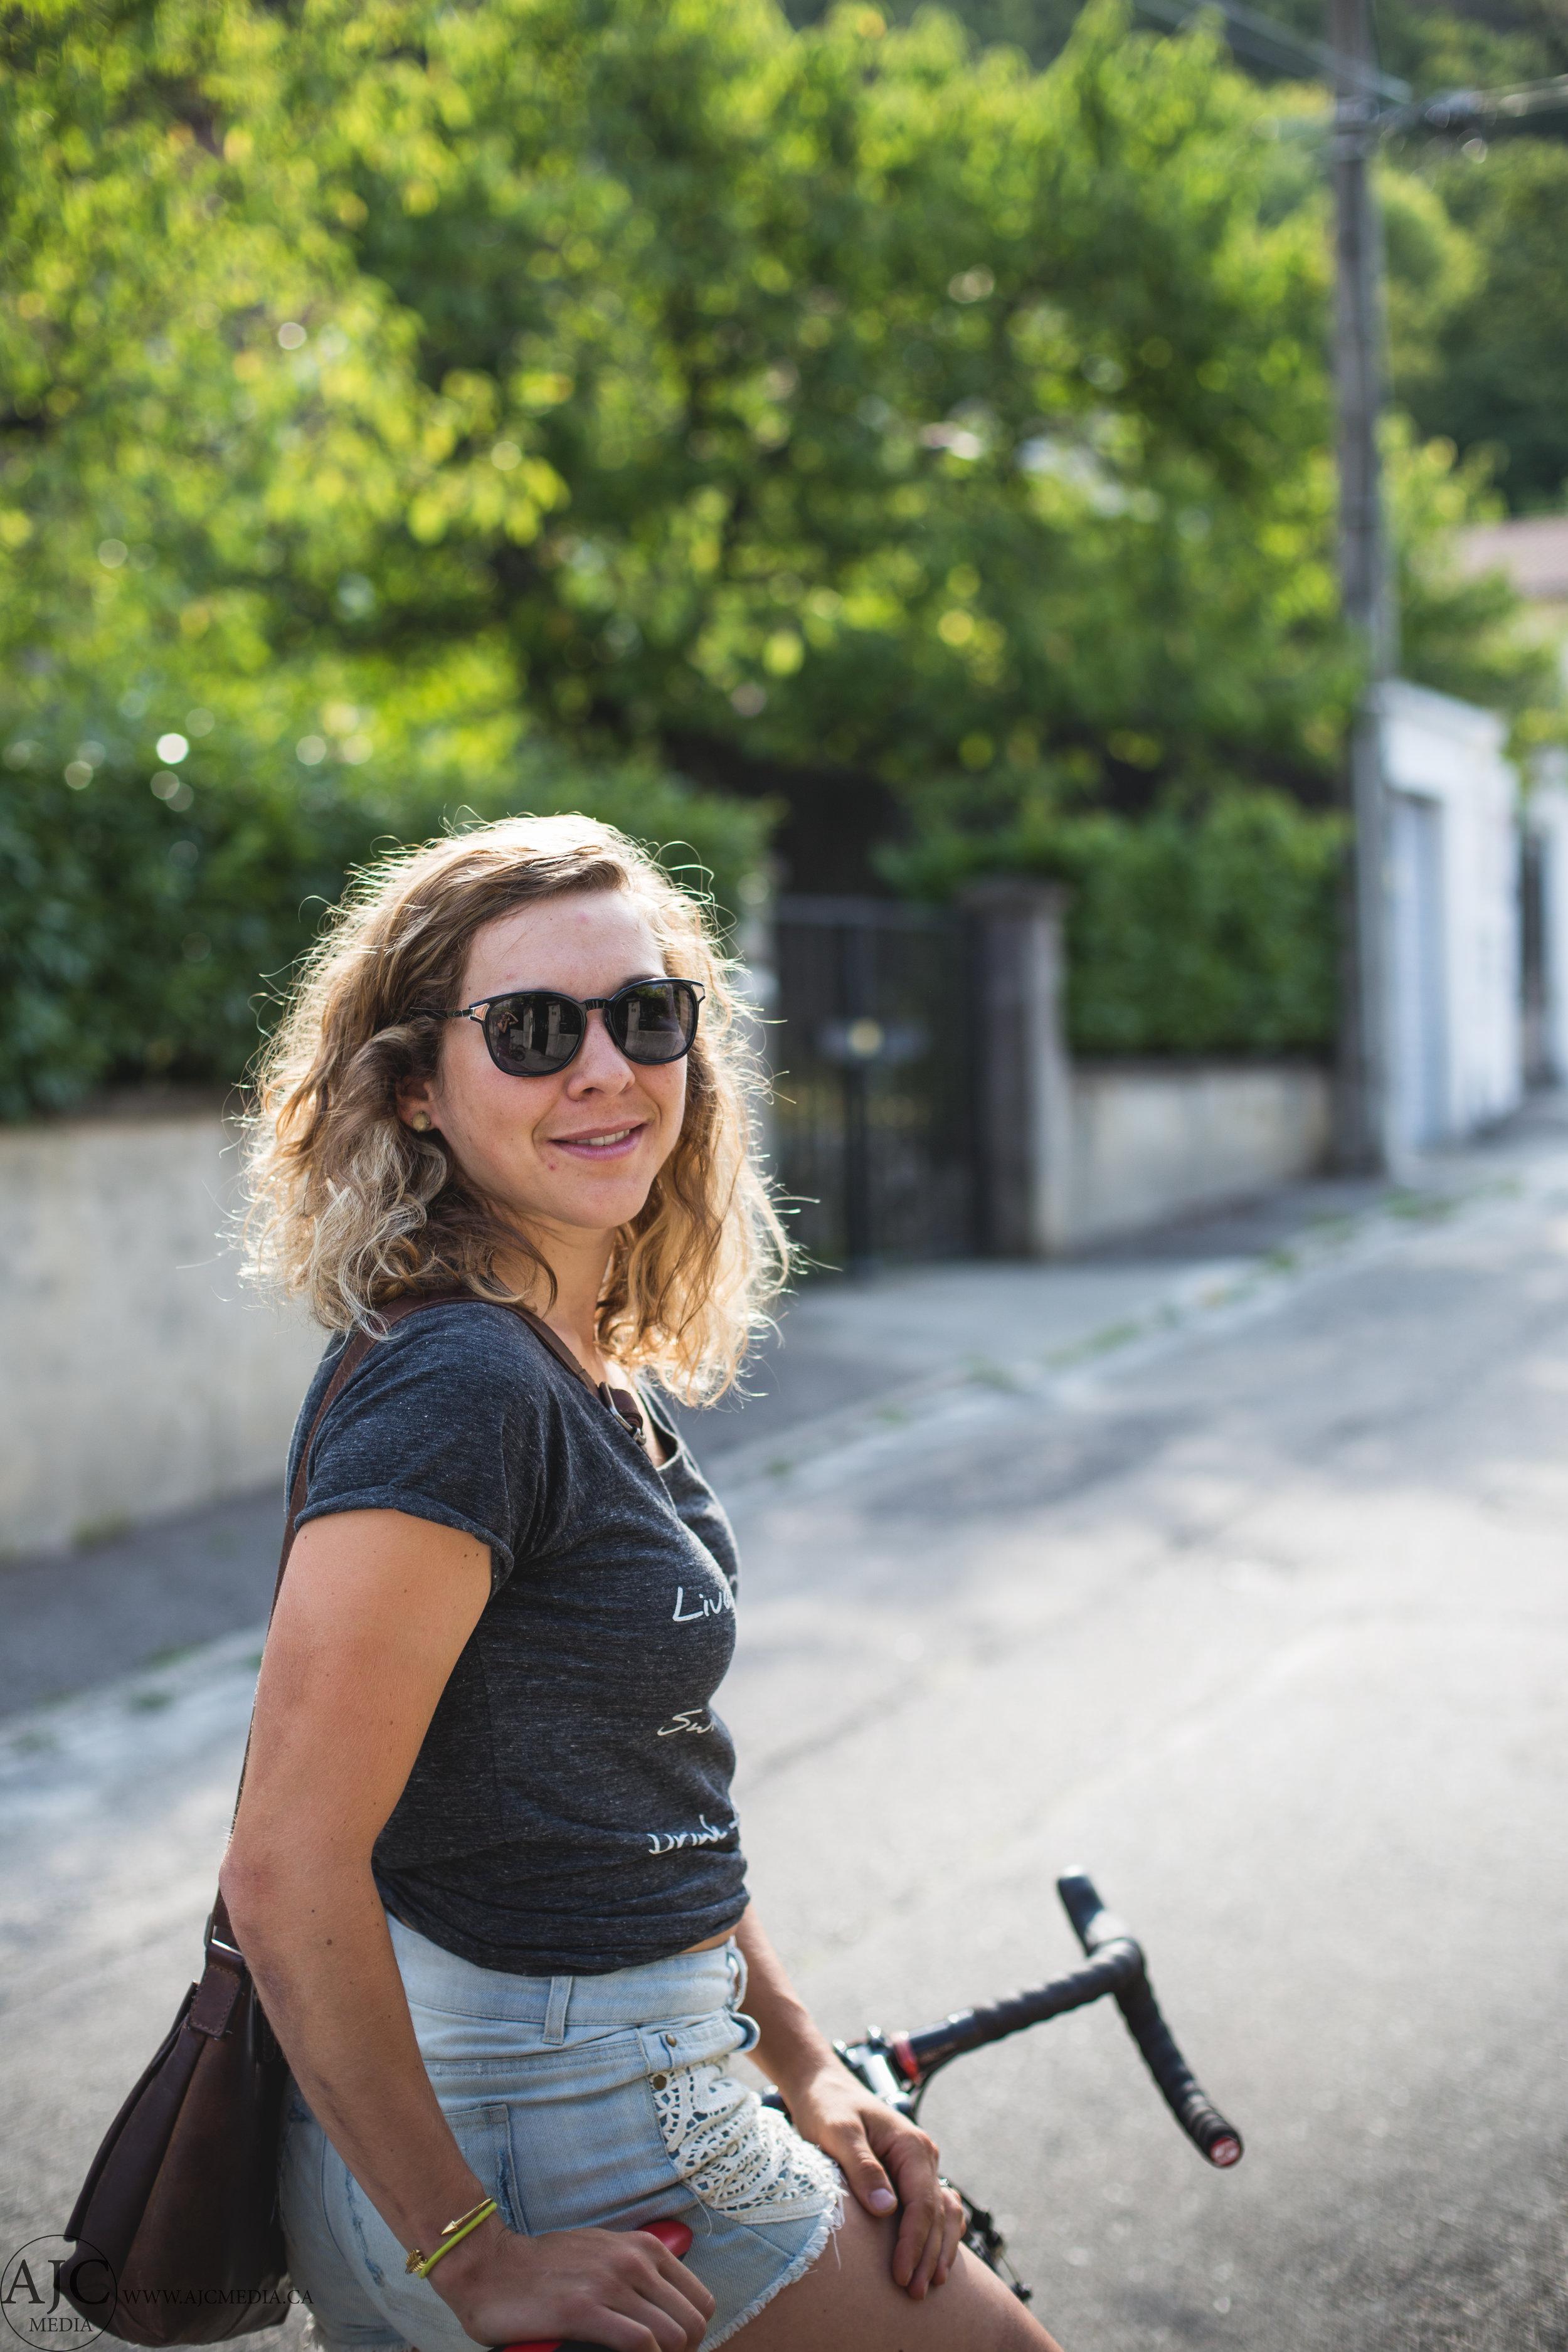 Pre-Bike Adventure